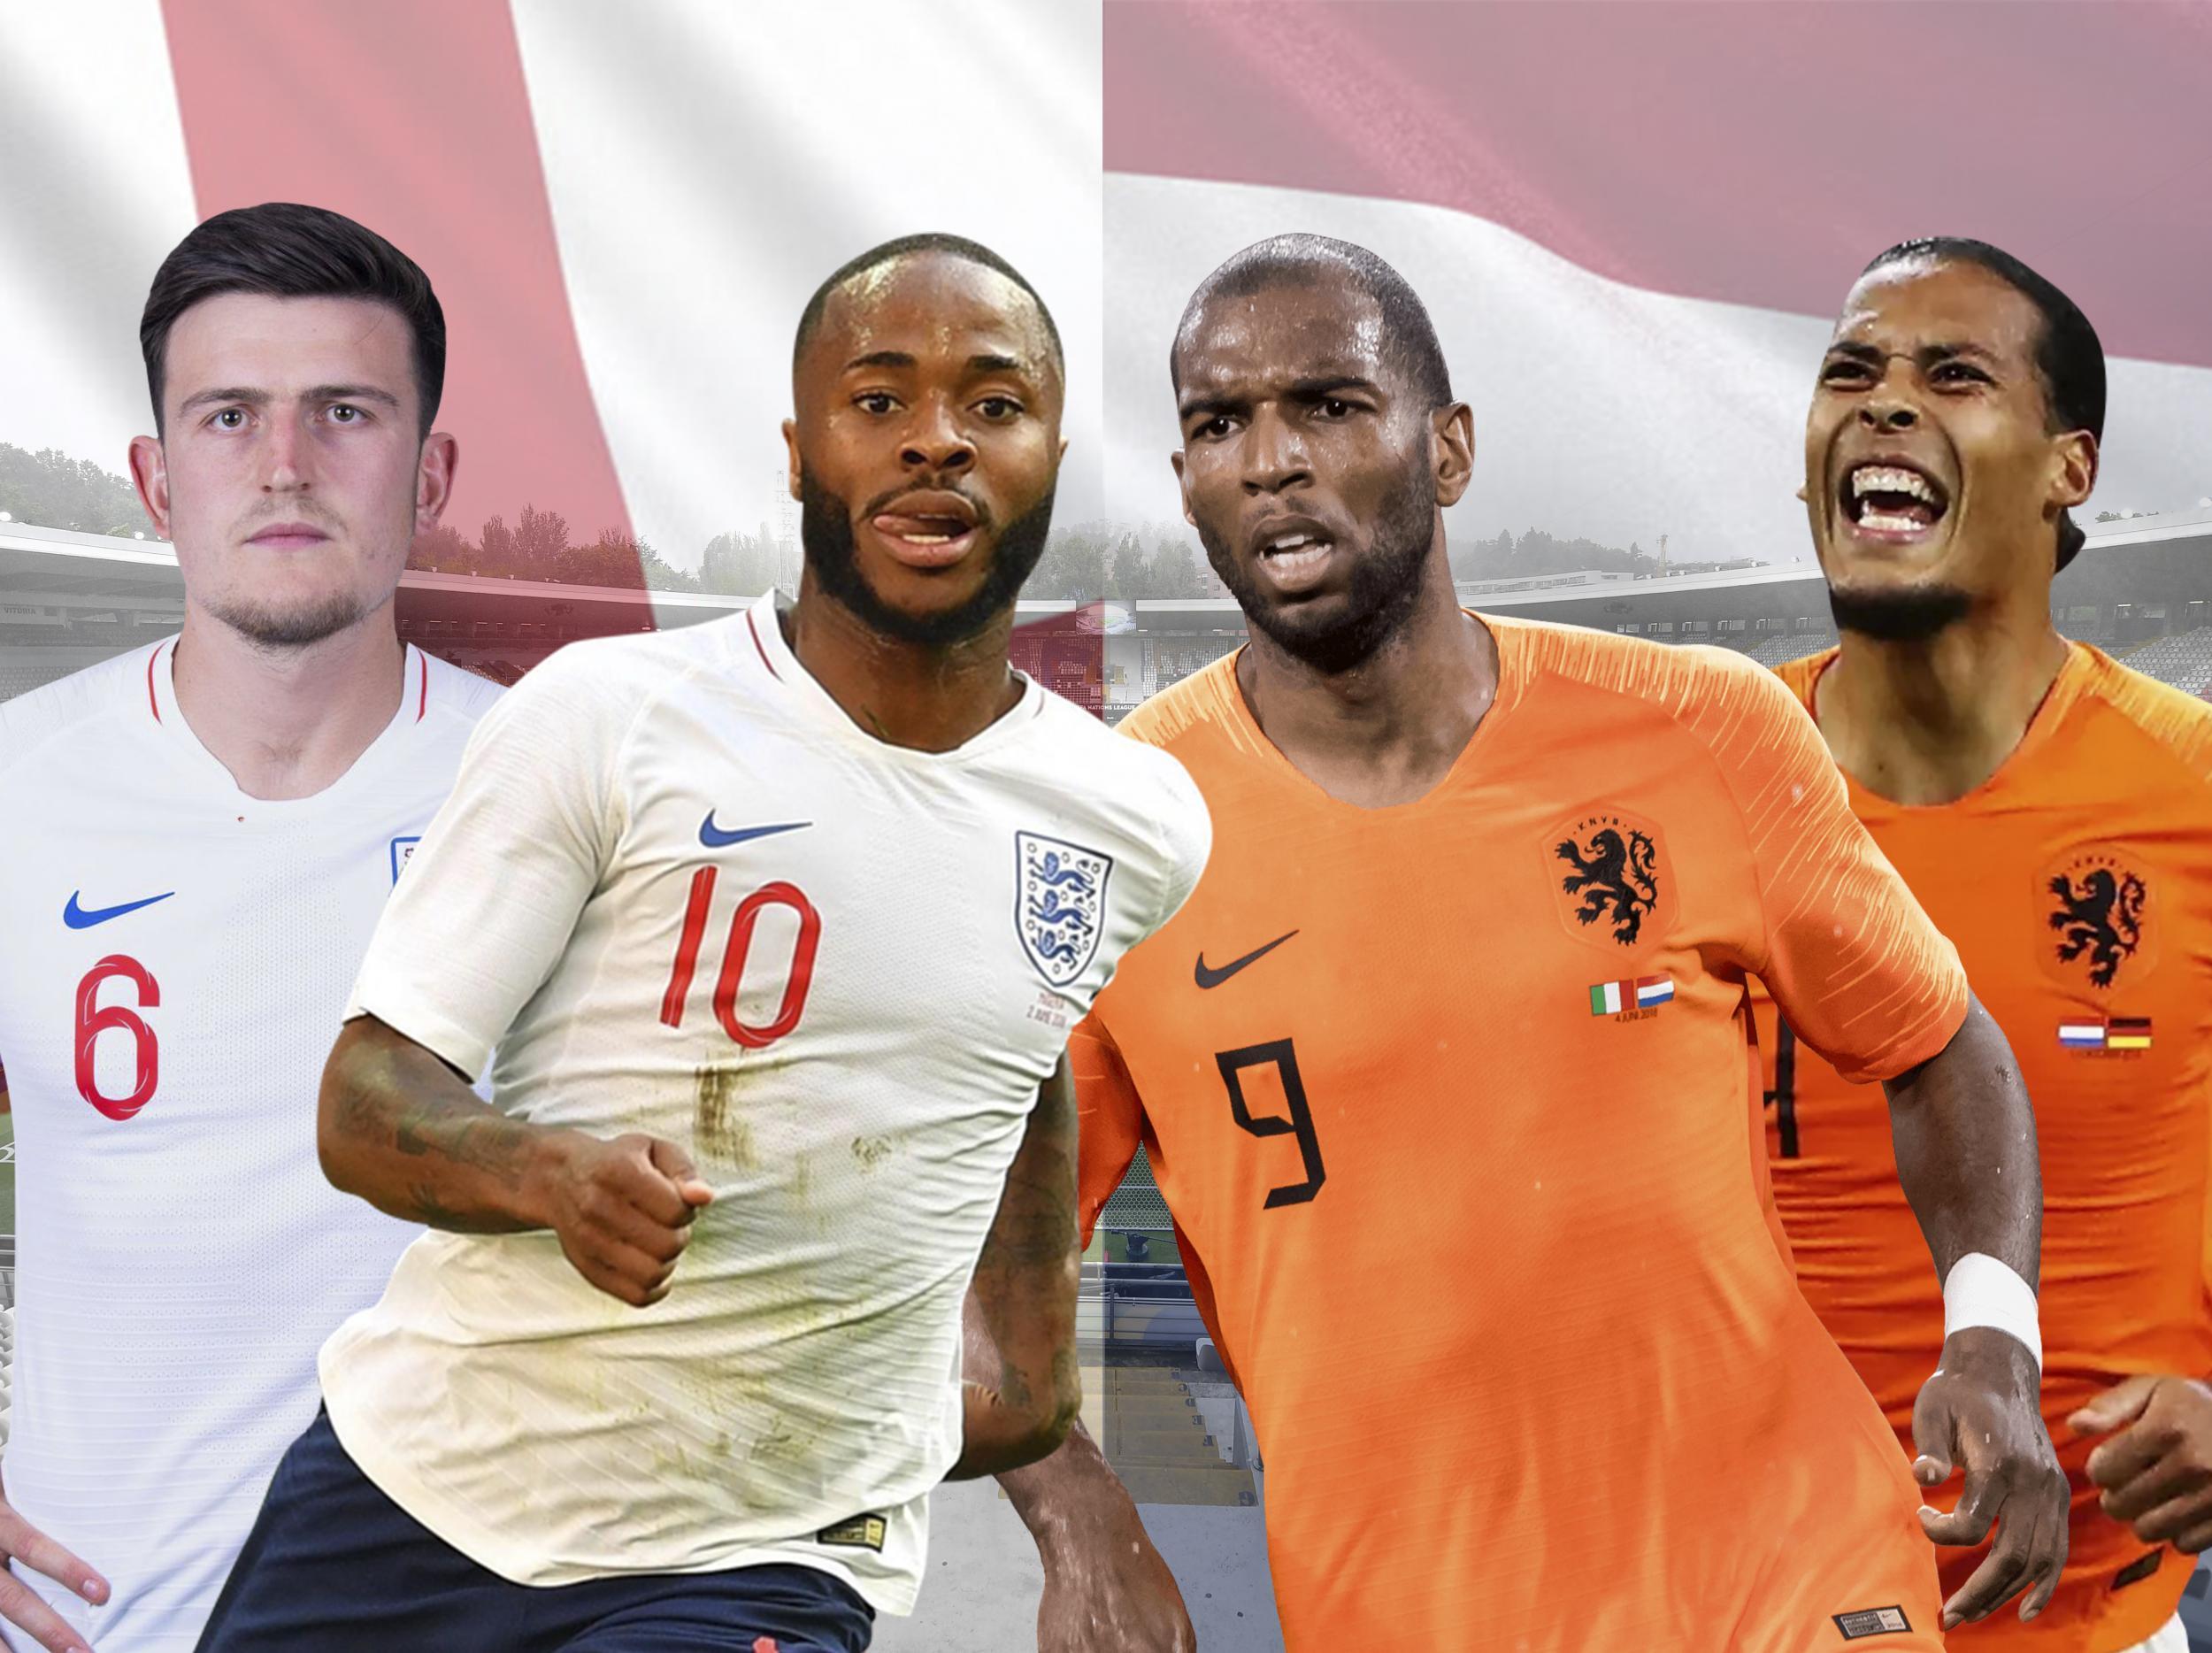 England vs Netherlands LIVE: Stream, TV channel, kick-off time, team news, Nations League semi-final